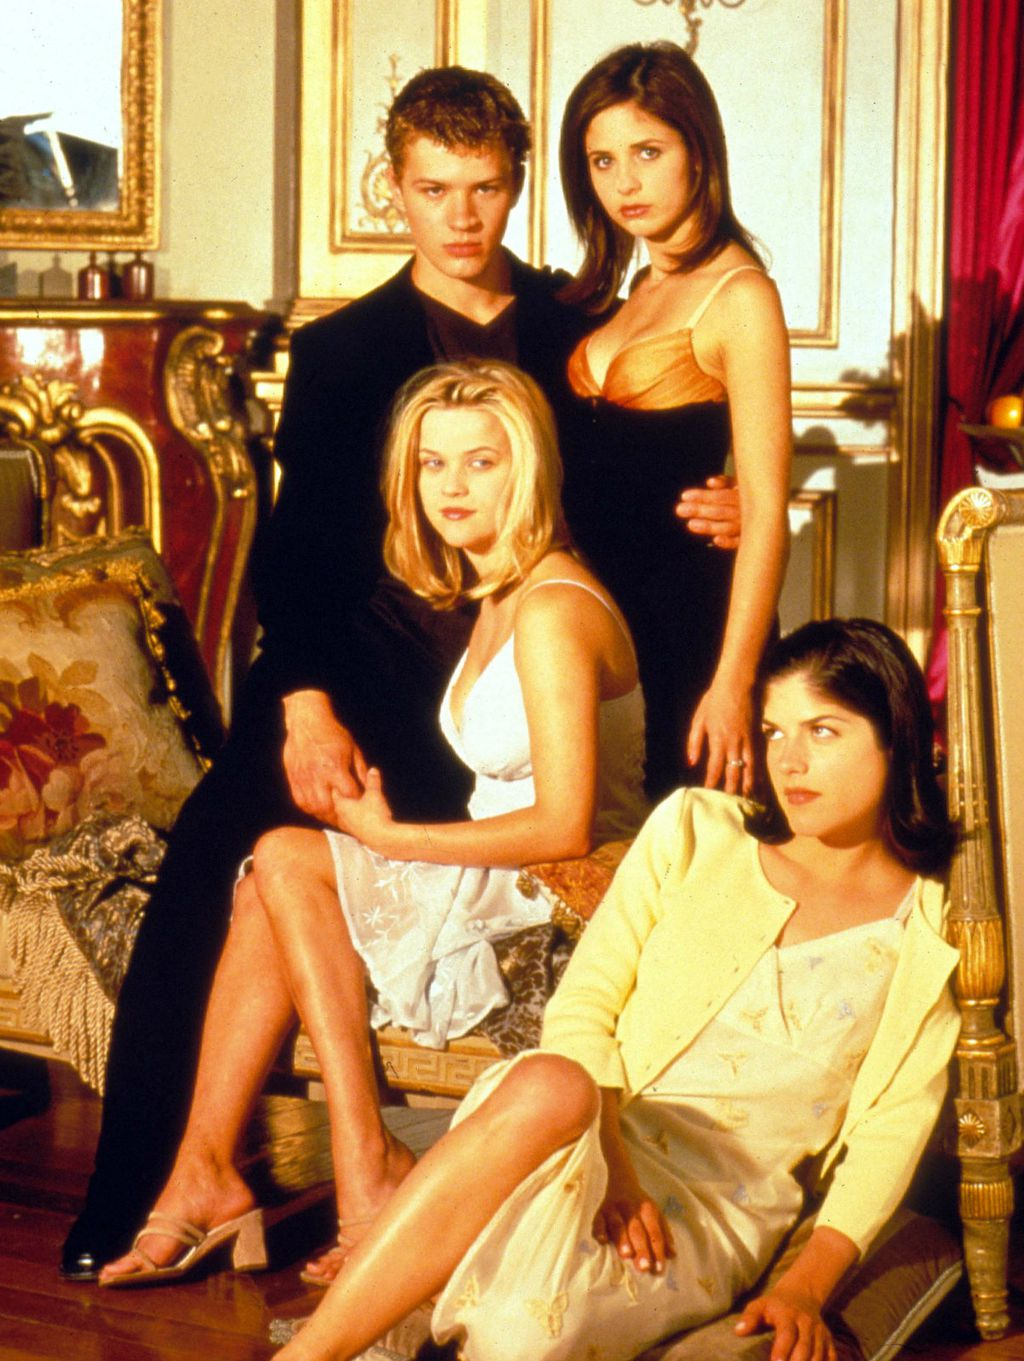 Ryan Phillippe, Sarah Michelle Gellar, Reese Witherspoon i Selma Blair glumili su u \